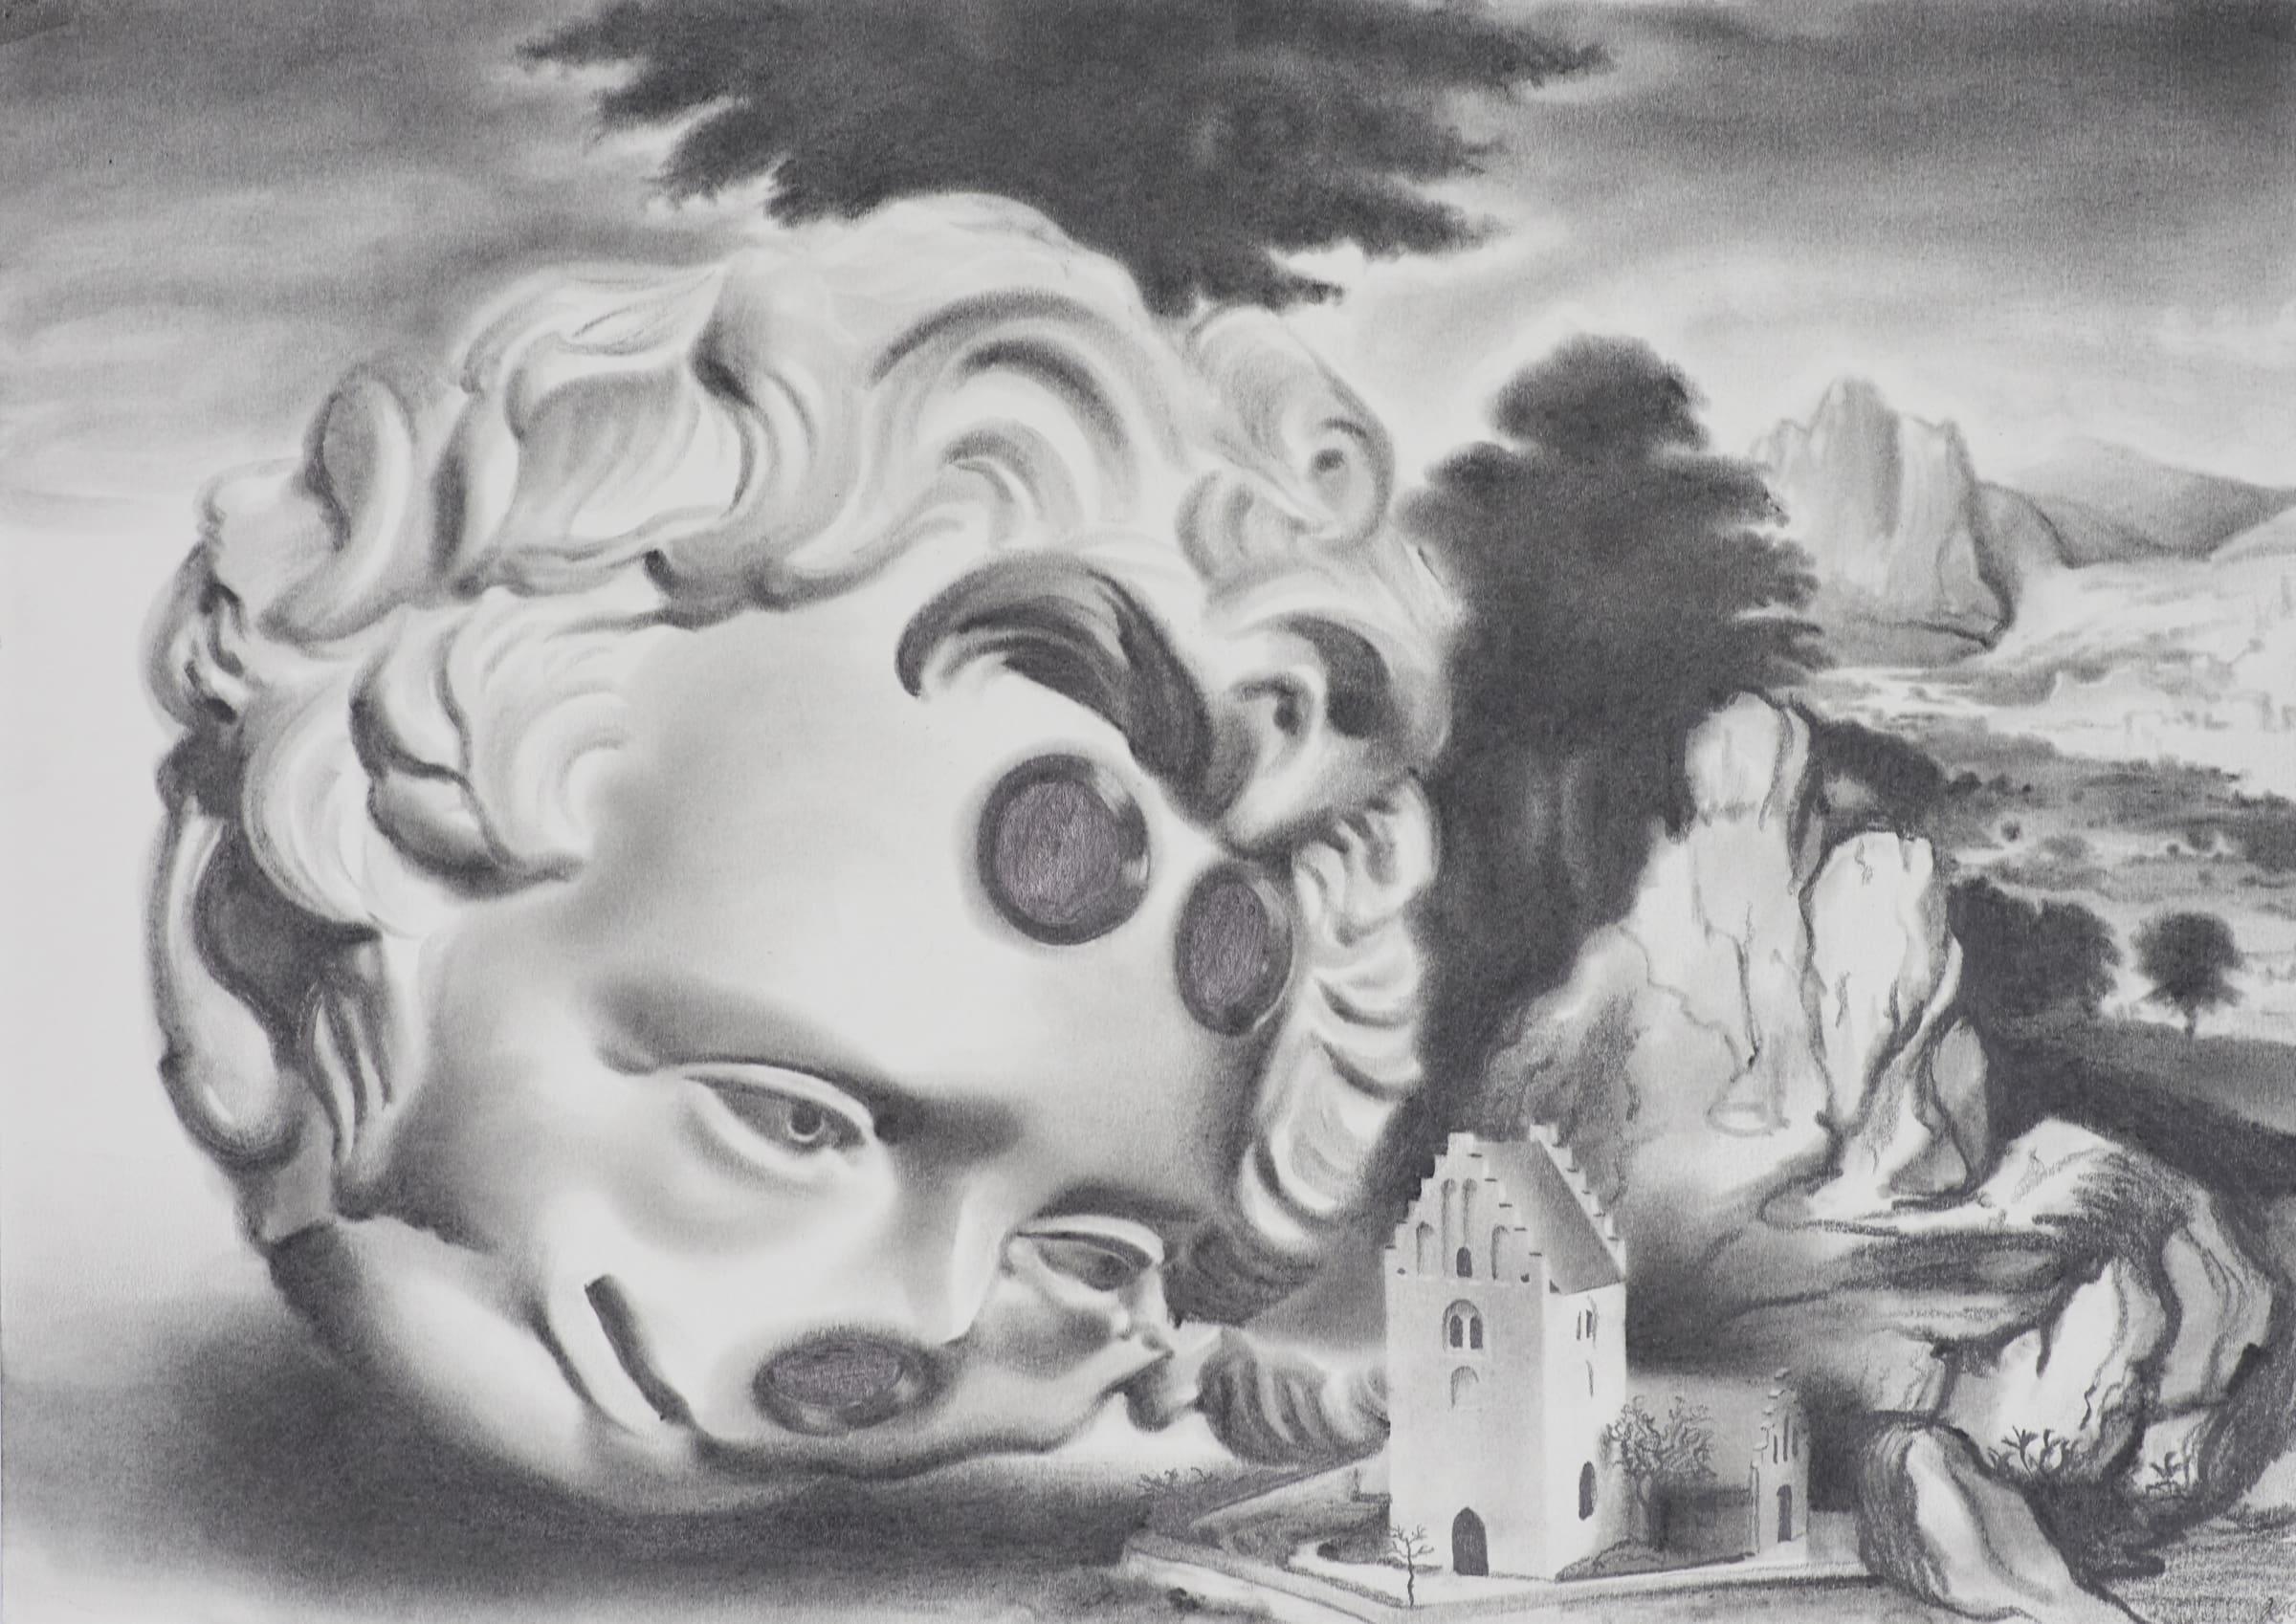 <span class=&#34;link fancybox-details-link&#34;><a href=&#34;/exhibitions/98/works/image2081/&#34;>View Detail Page</a></span><div id=&#34;artwork-panel-details&#34; class=&#34;standard-artwork-details&#34;><div class=&#34;artist&#34;><strong>Robert McNally</strong></div><div class=&#34;title&#34;><em>Does whatever her wants</em>, 2017</div><div class=&#34;medium&#34;>Graphite on paper</div><div class=&#34;dimensions&#34;>30 x 42 cm<br /> 11 3/4 x 16 1/2 in</div></div>